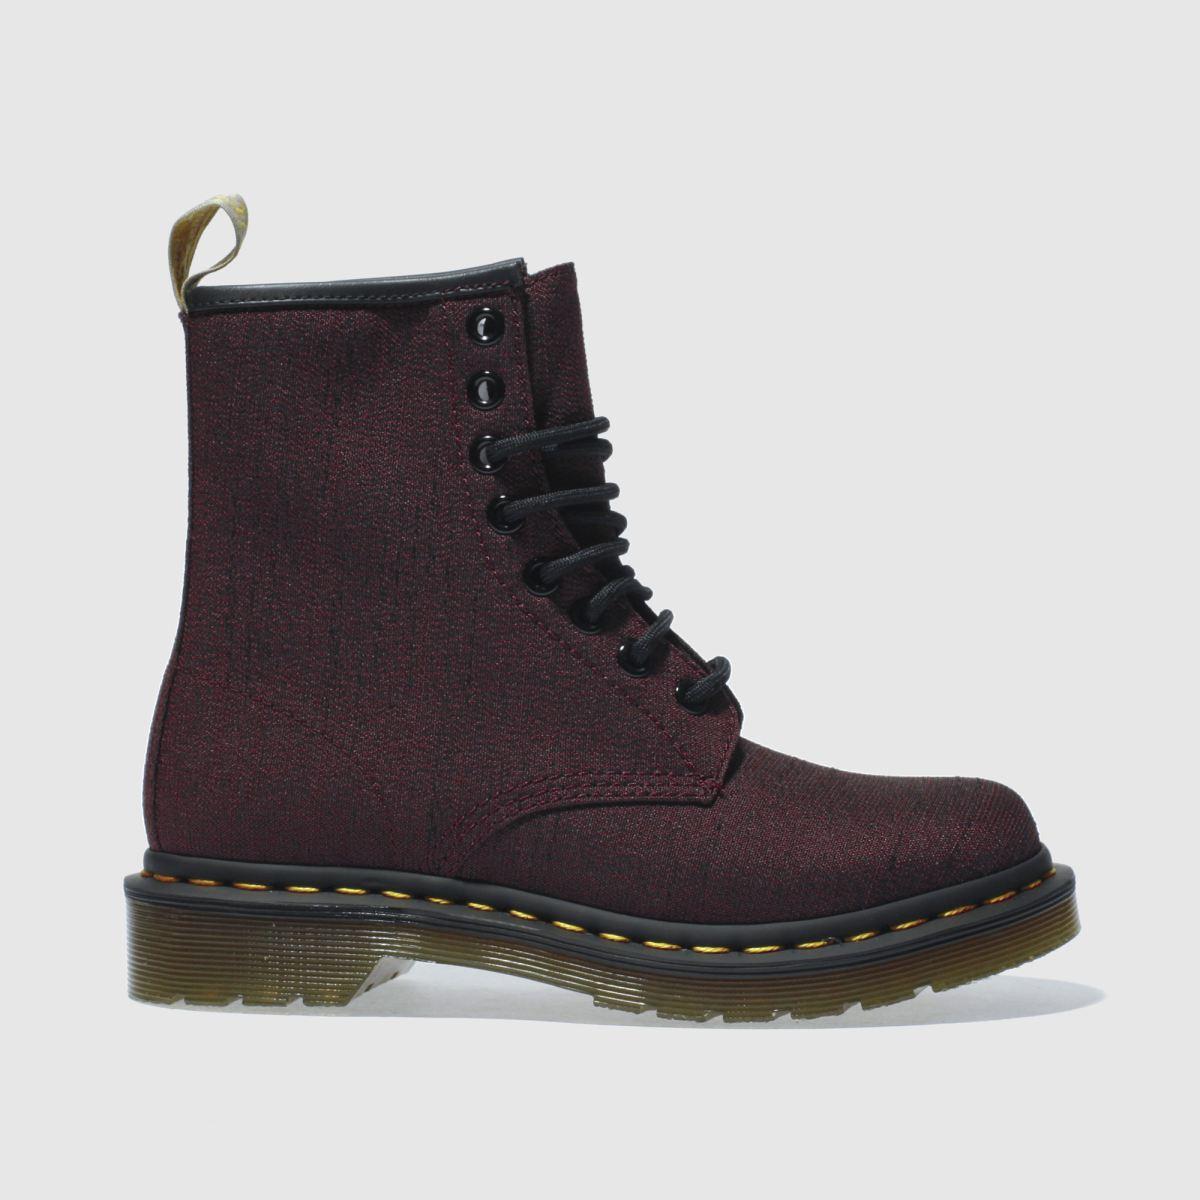 dr martens burgundy vegan castel 8 eye boots